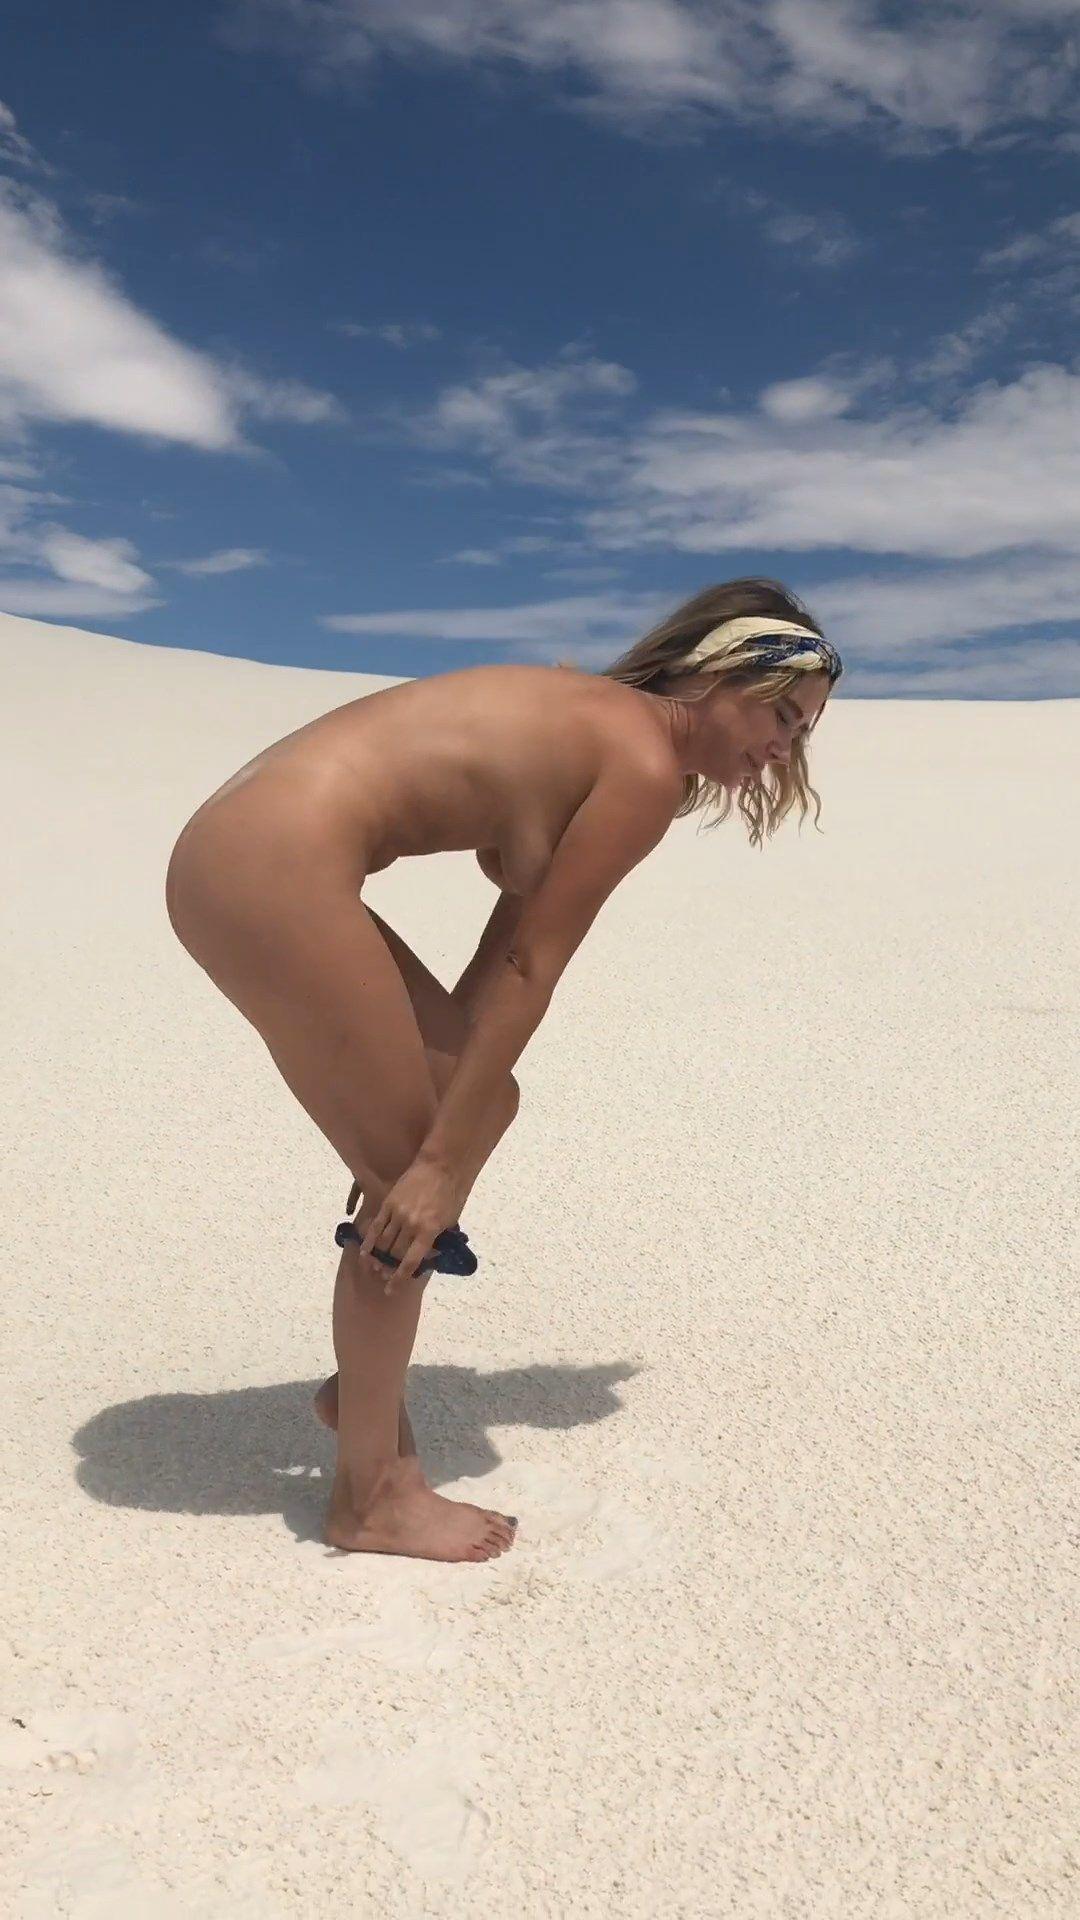 Leaked Sara Jean Underwood nudes (86 foto and video), Pussy, Paparazzi, Feet, legs 2020